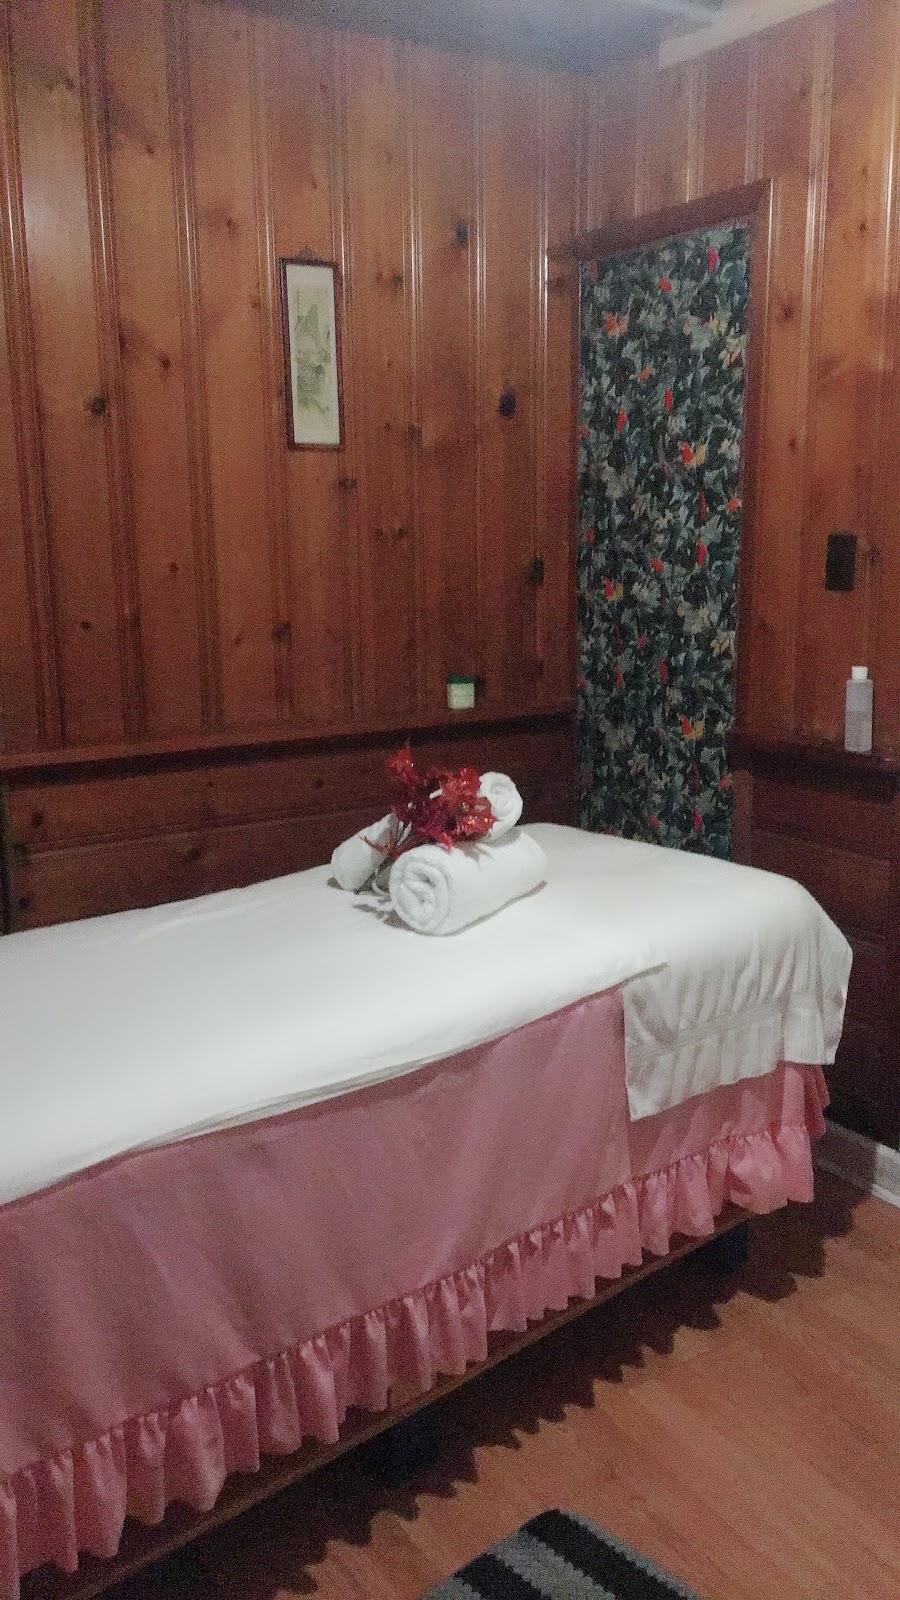 Asian Magic Spa - spa    Photo 1 of 10   Address: 2730 Grand Blvd, Holiday, FL 34690, USA   Phone: (727) 312-7314